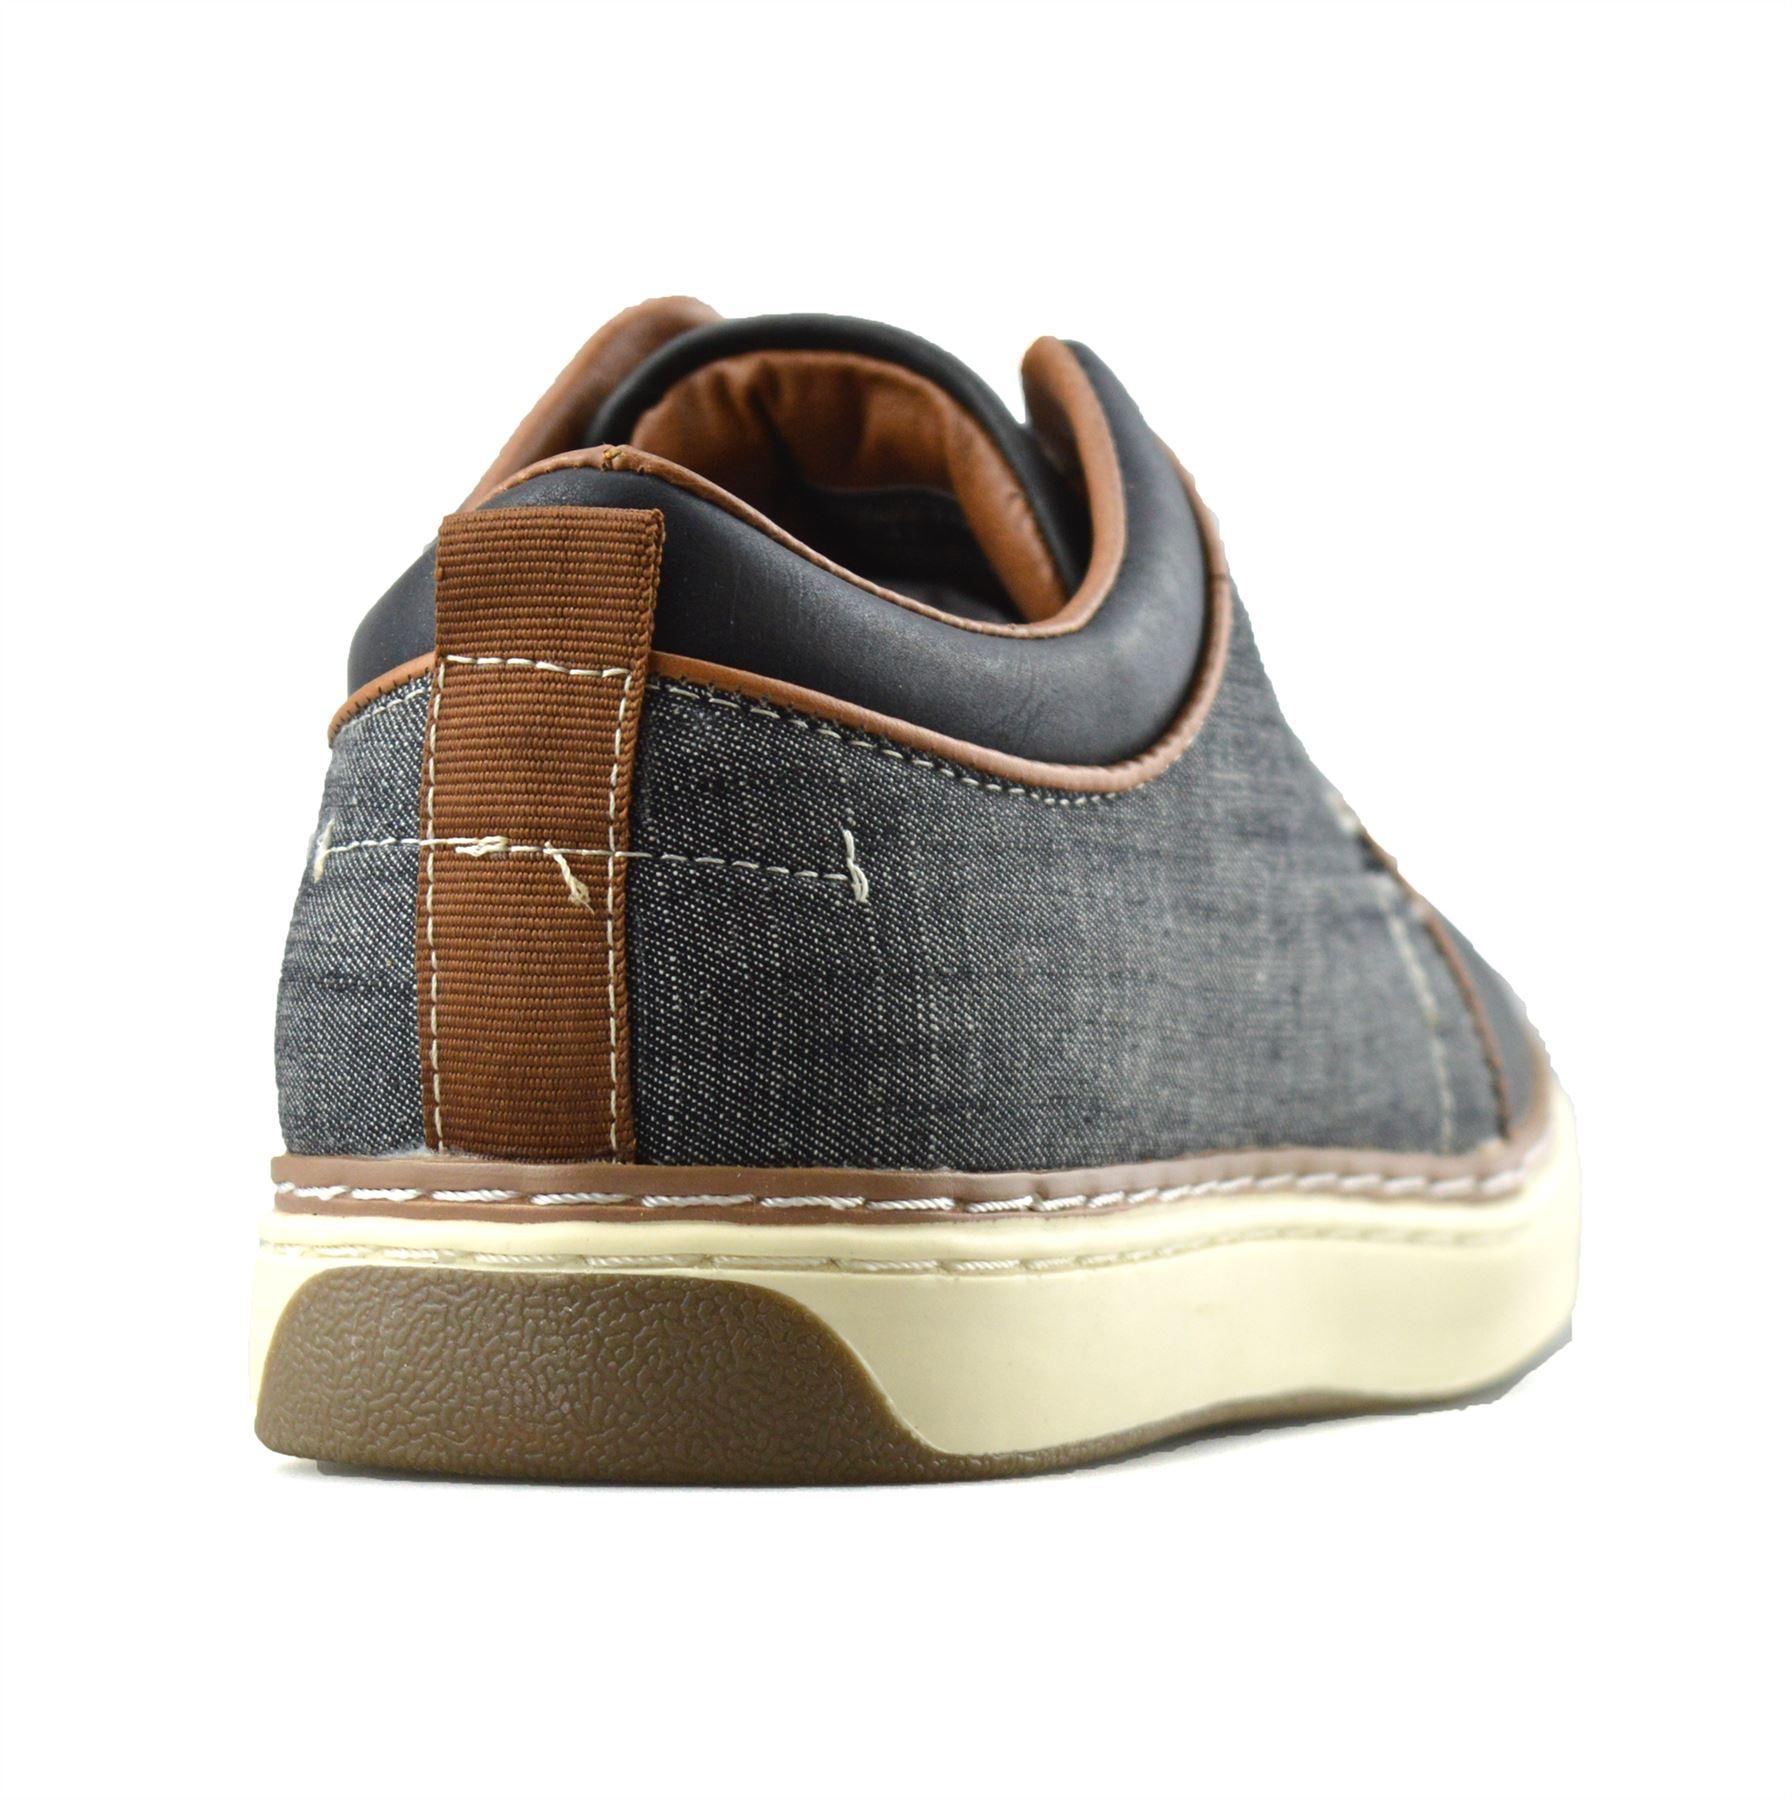 Homme-Nouveau-Casual-Smart-bateau-pont-Mocassin-Walking-Driving-Work-Lace-Up-Chaussures-Taille miniature 14